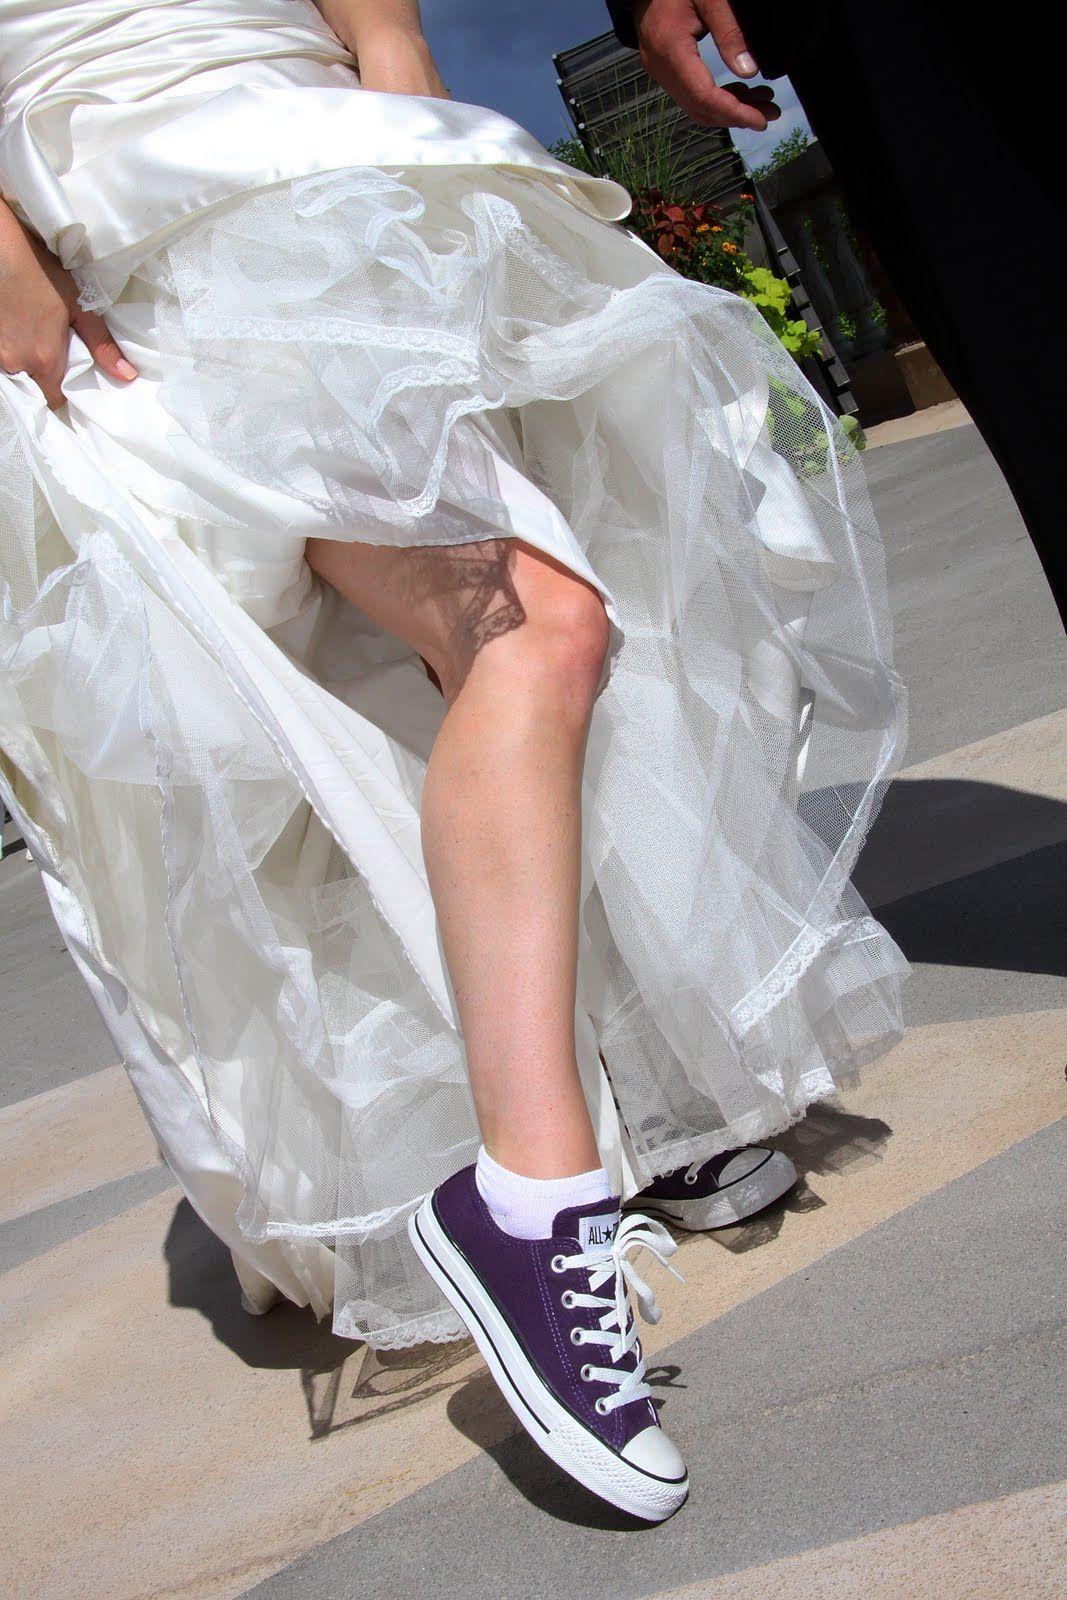 Wedding SHOES + Wedding COLOR! http://www.denisemackphotography.com/#!/DMP_Home